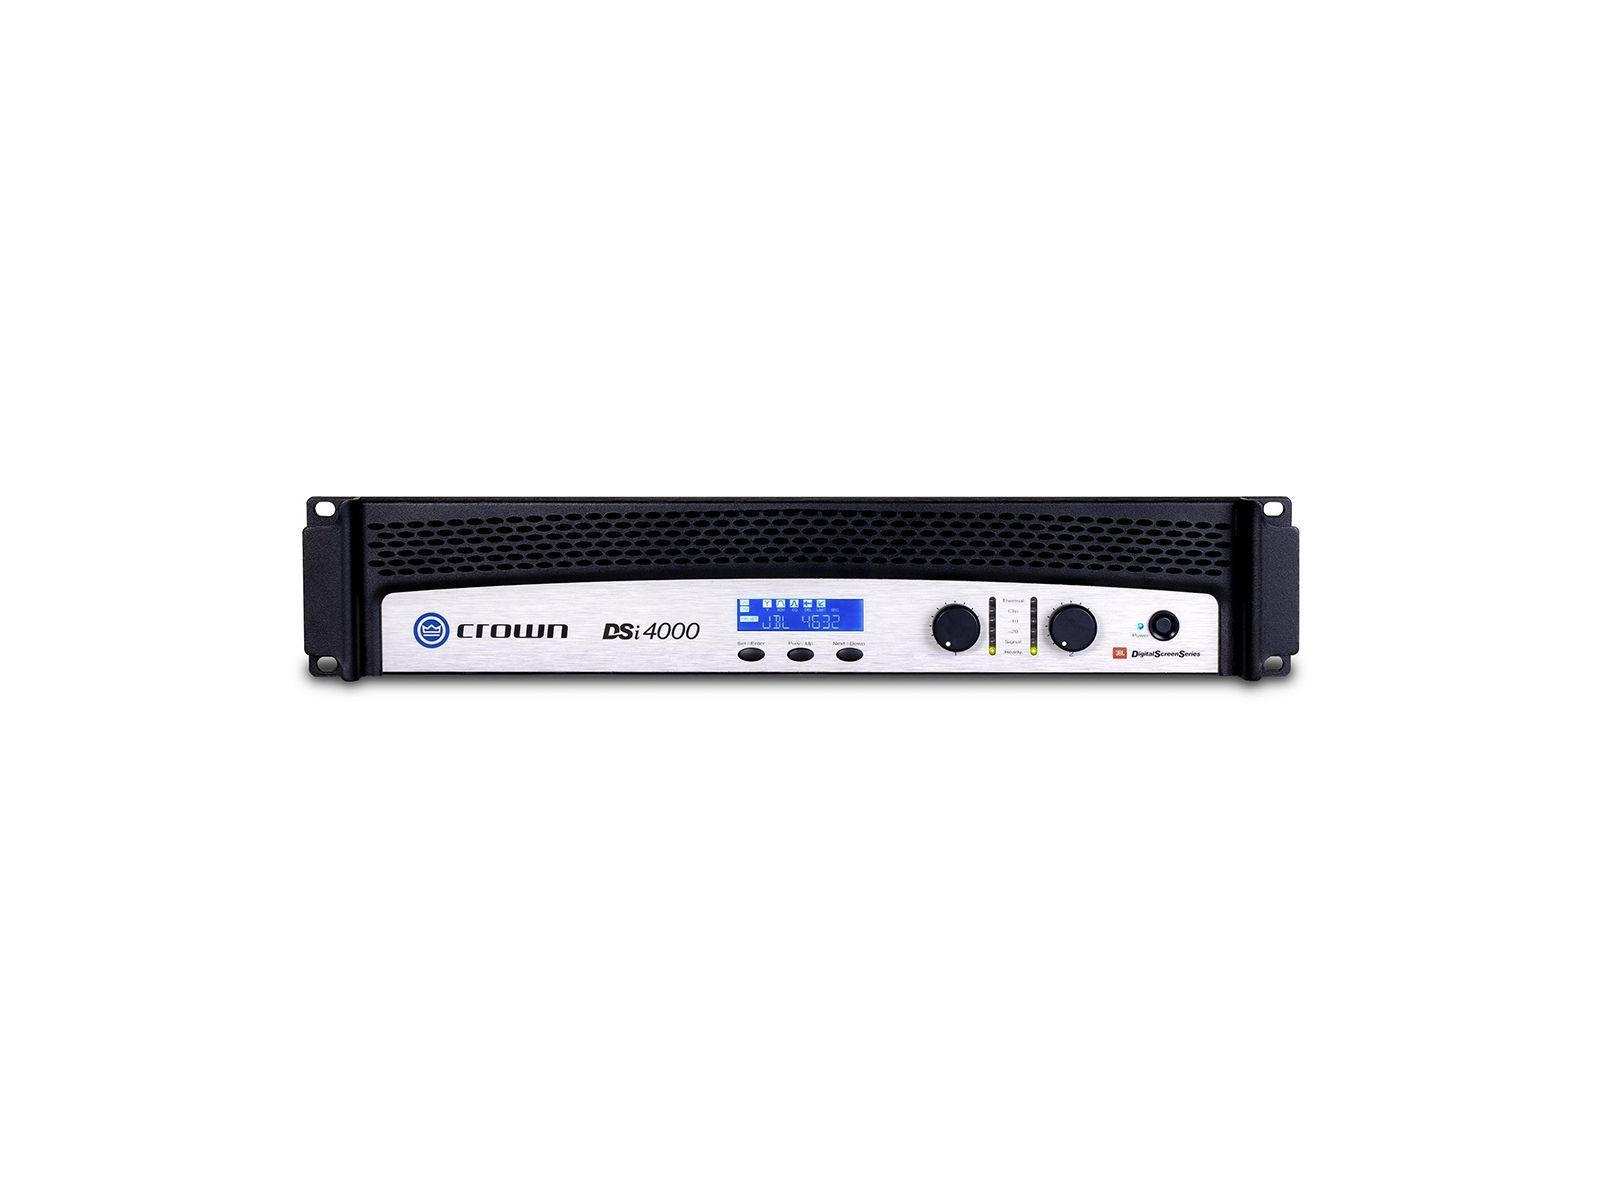 Crown DSi 4000 | Endstufe, 2x 1200W/4Ω, DSP, LCD, HiQnet, Phoenix, D-Sub, Cinema (THX approved)